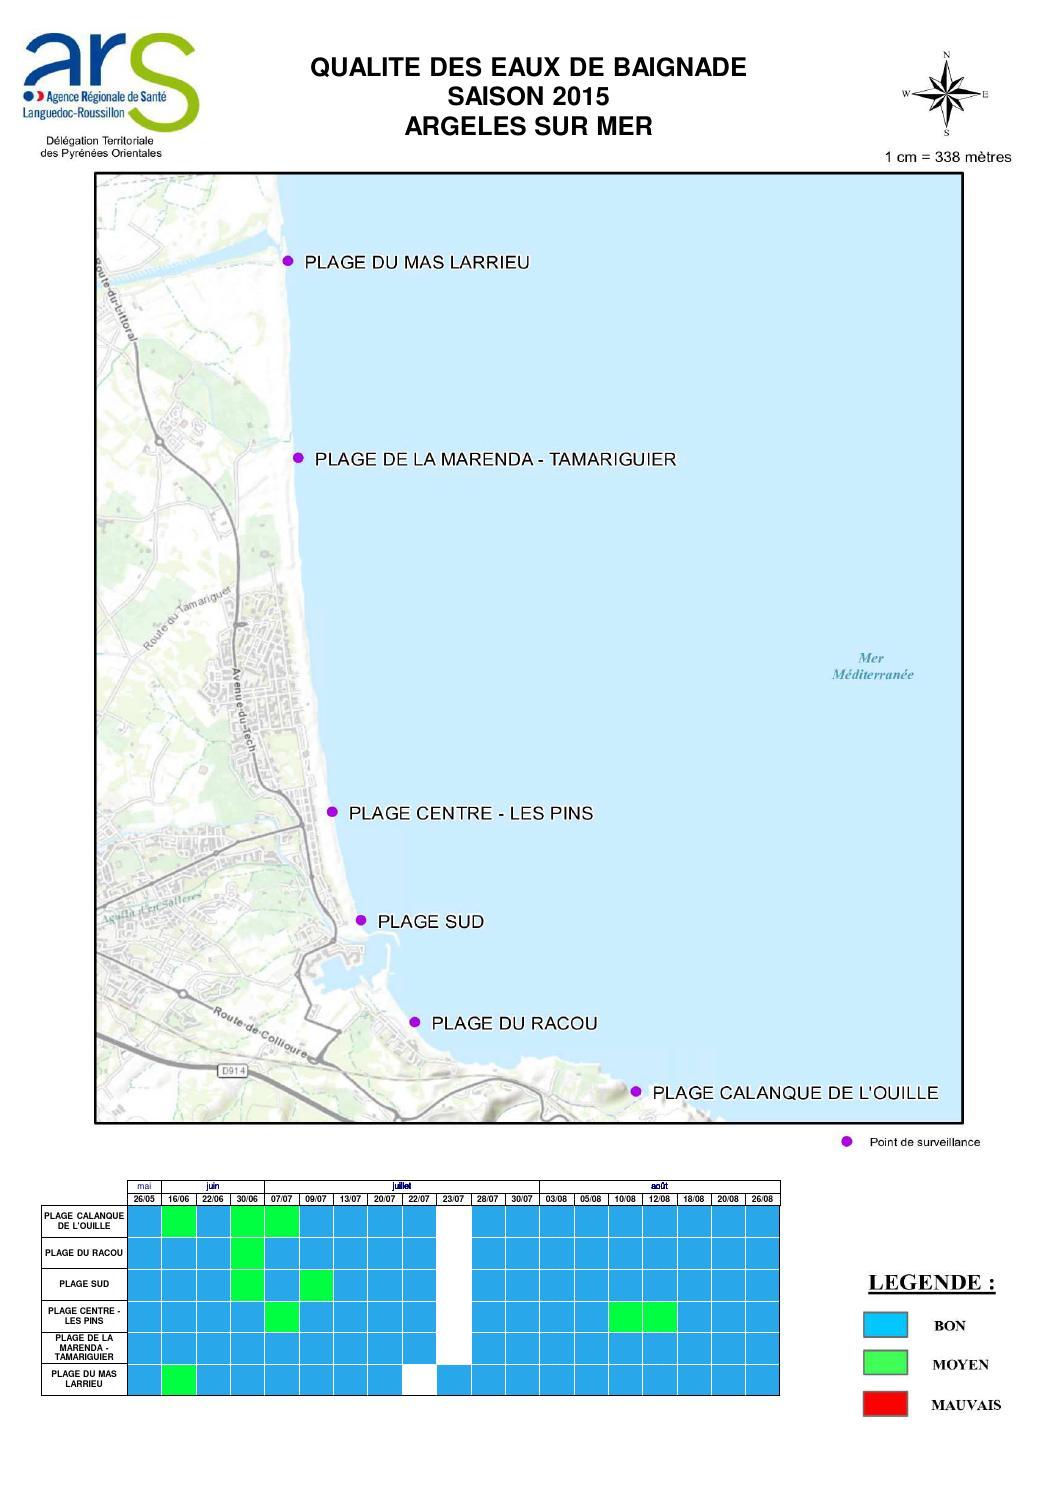 Carte argeles sur mer 26 08 2015 by Argelès-sur-Mer - Issuu